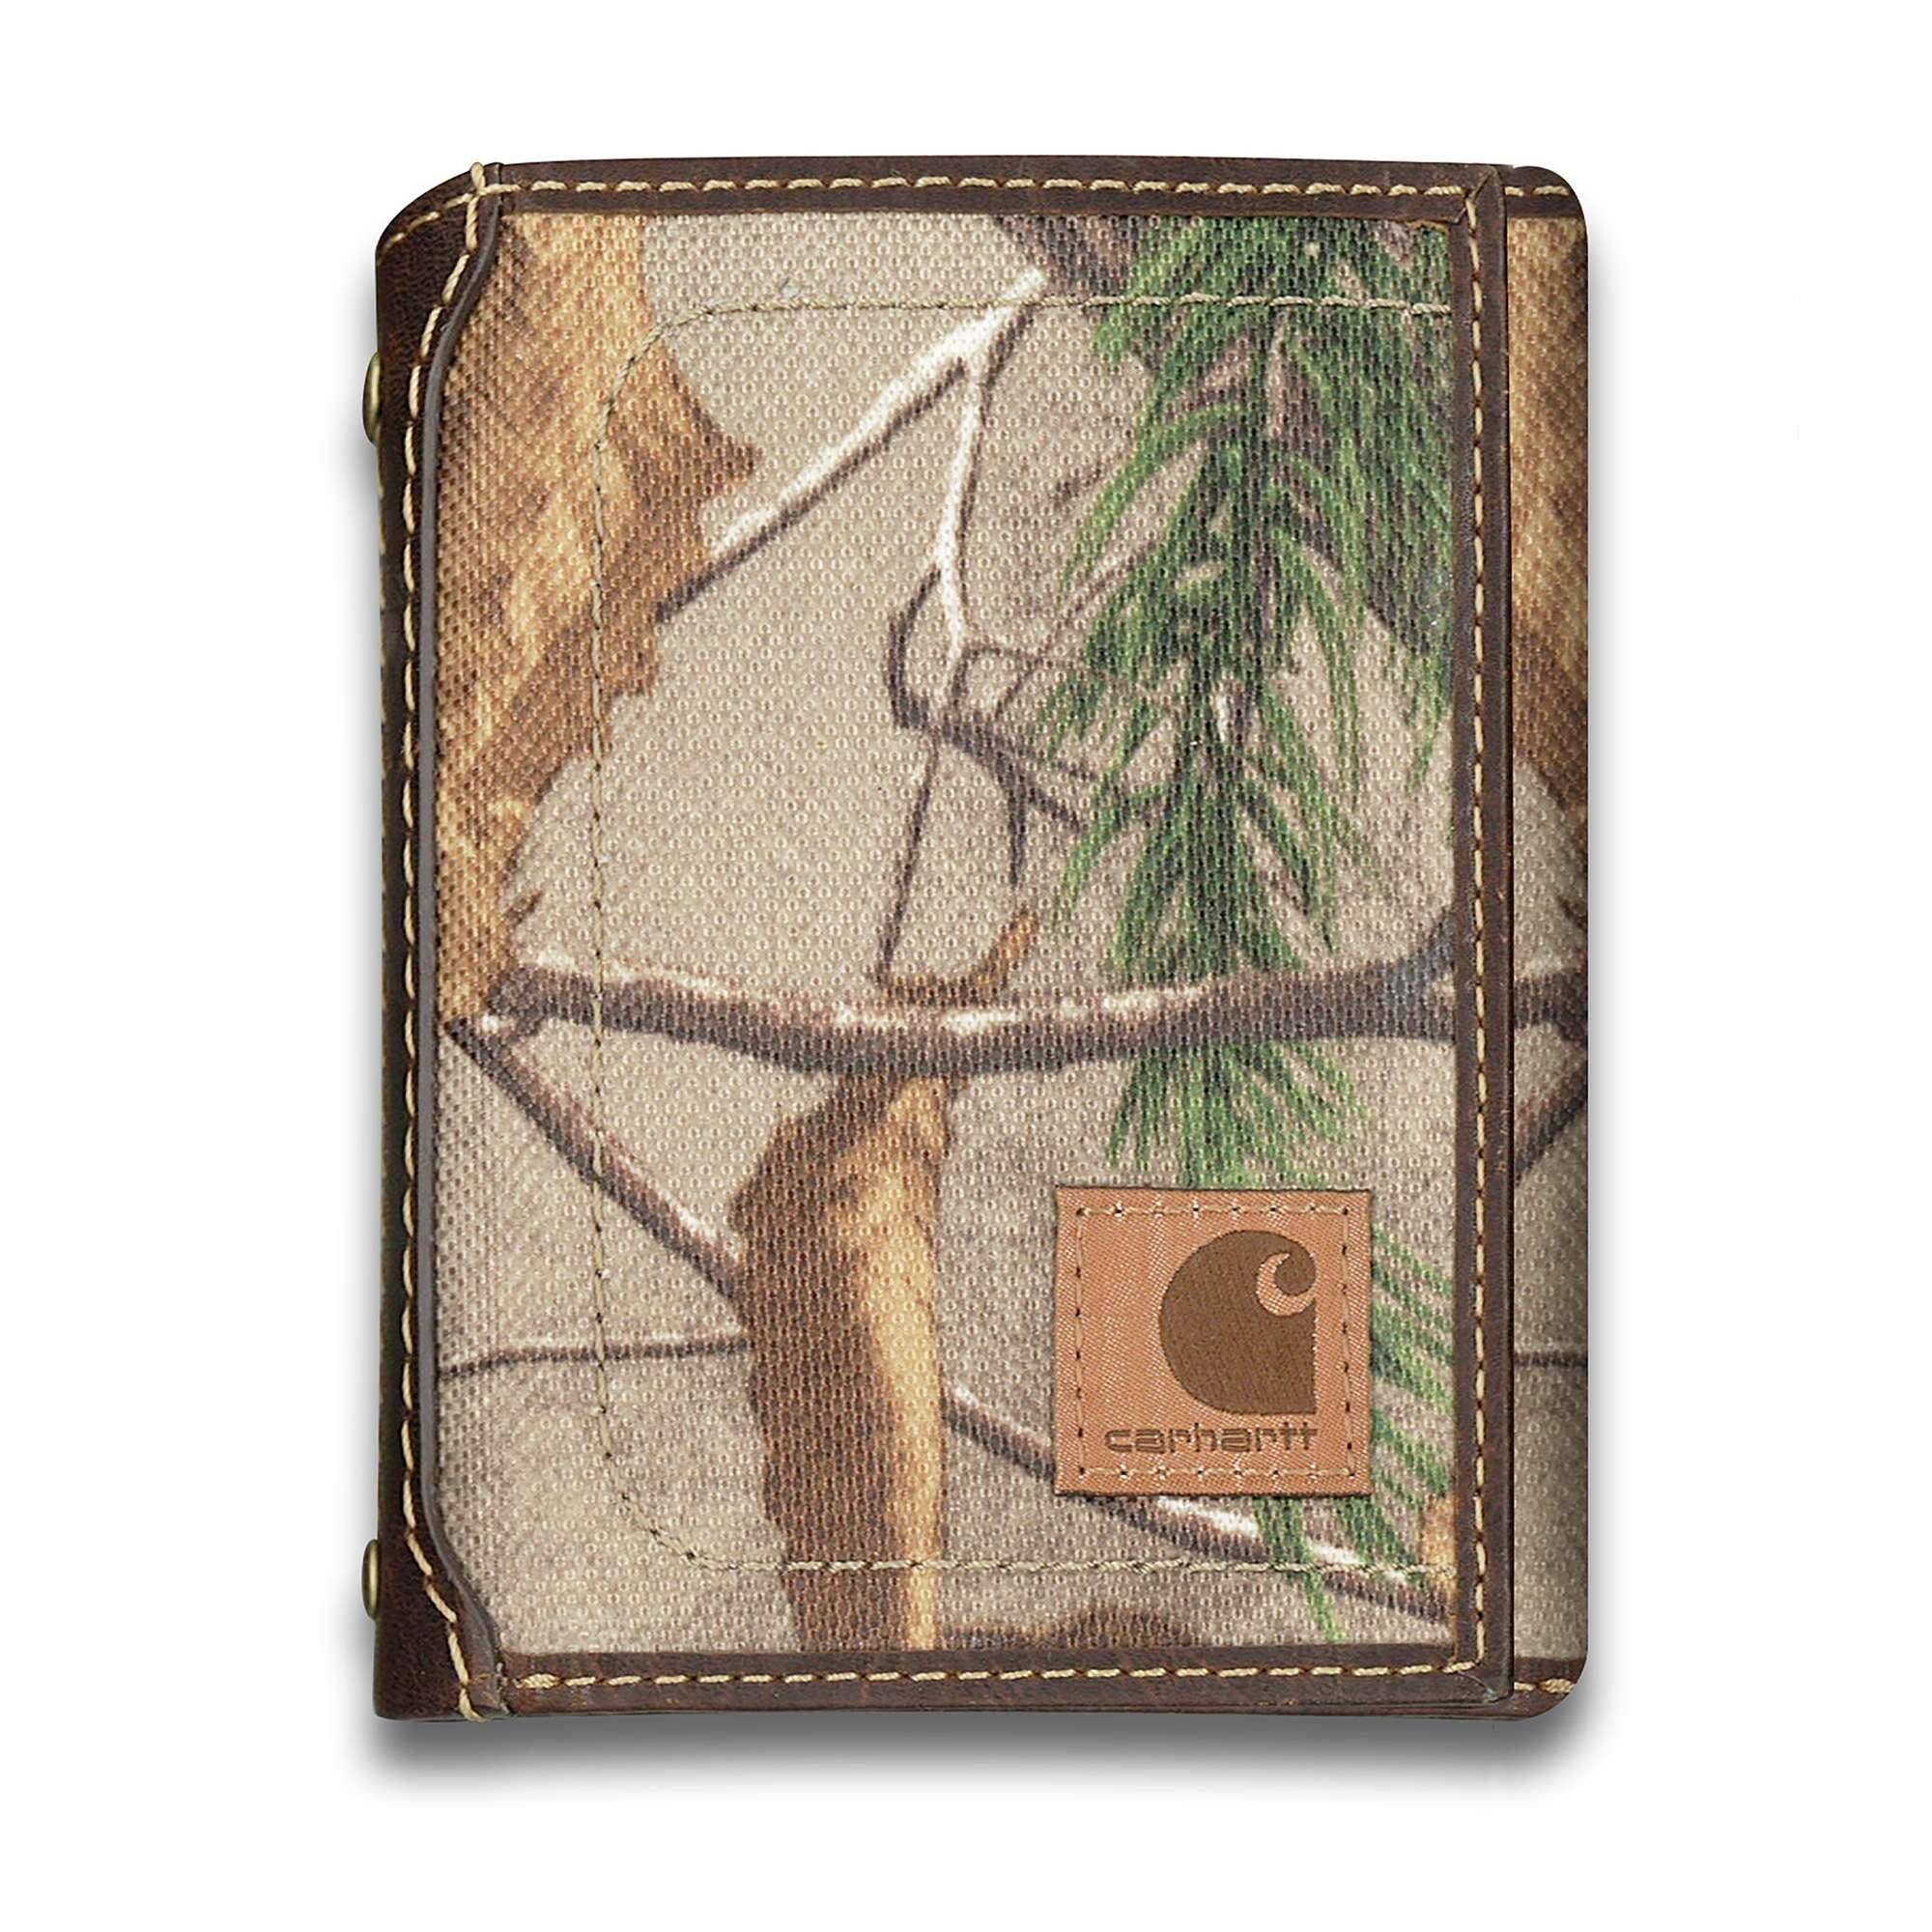 Carhartt Realtree Trifold Wallet